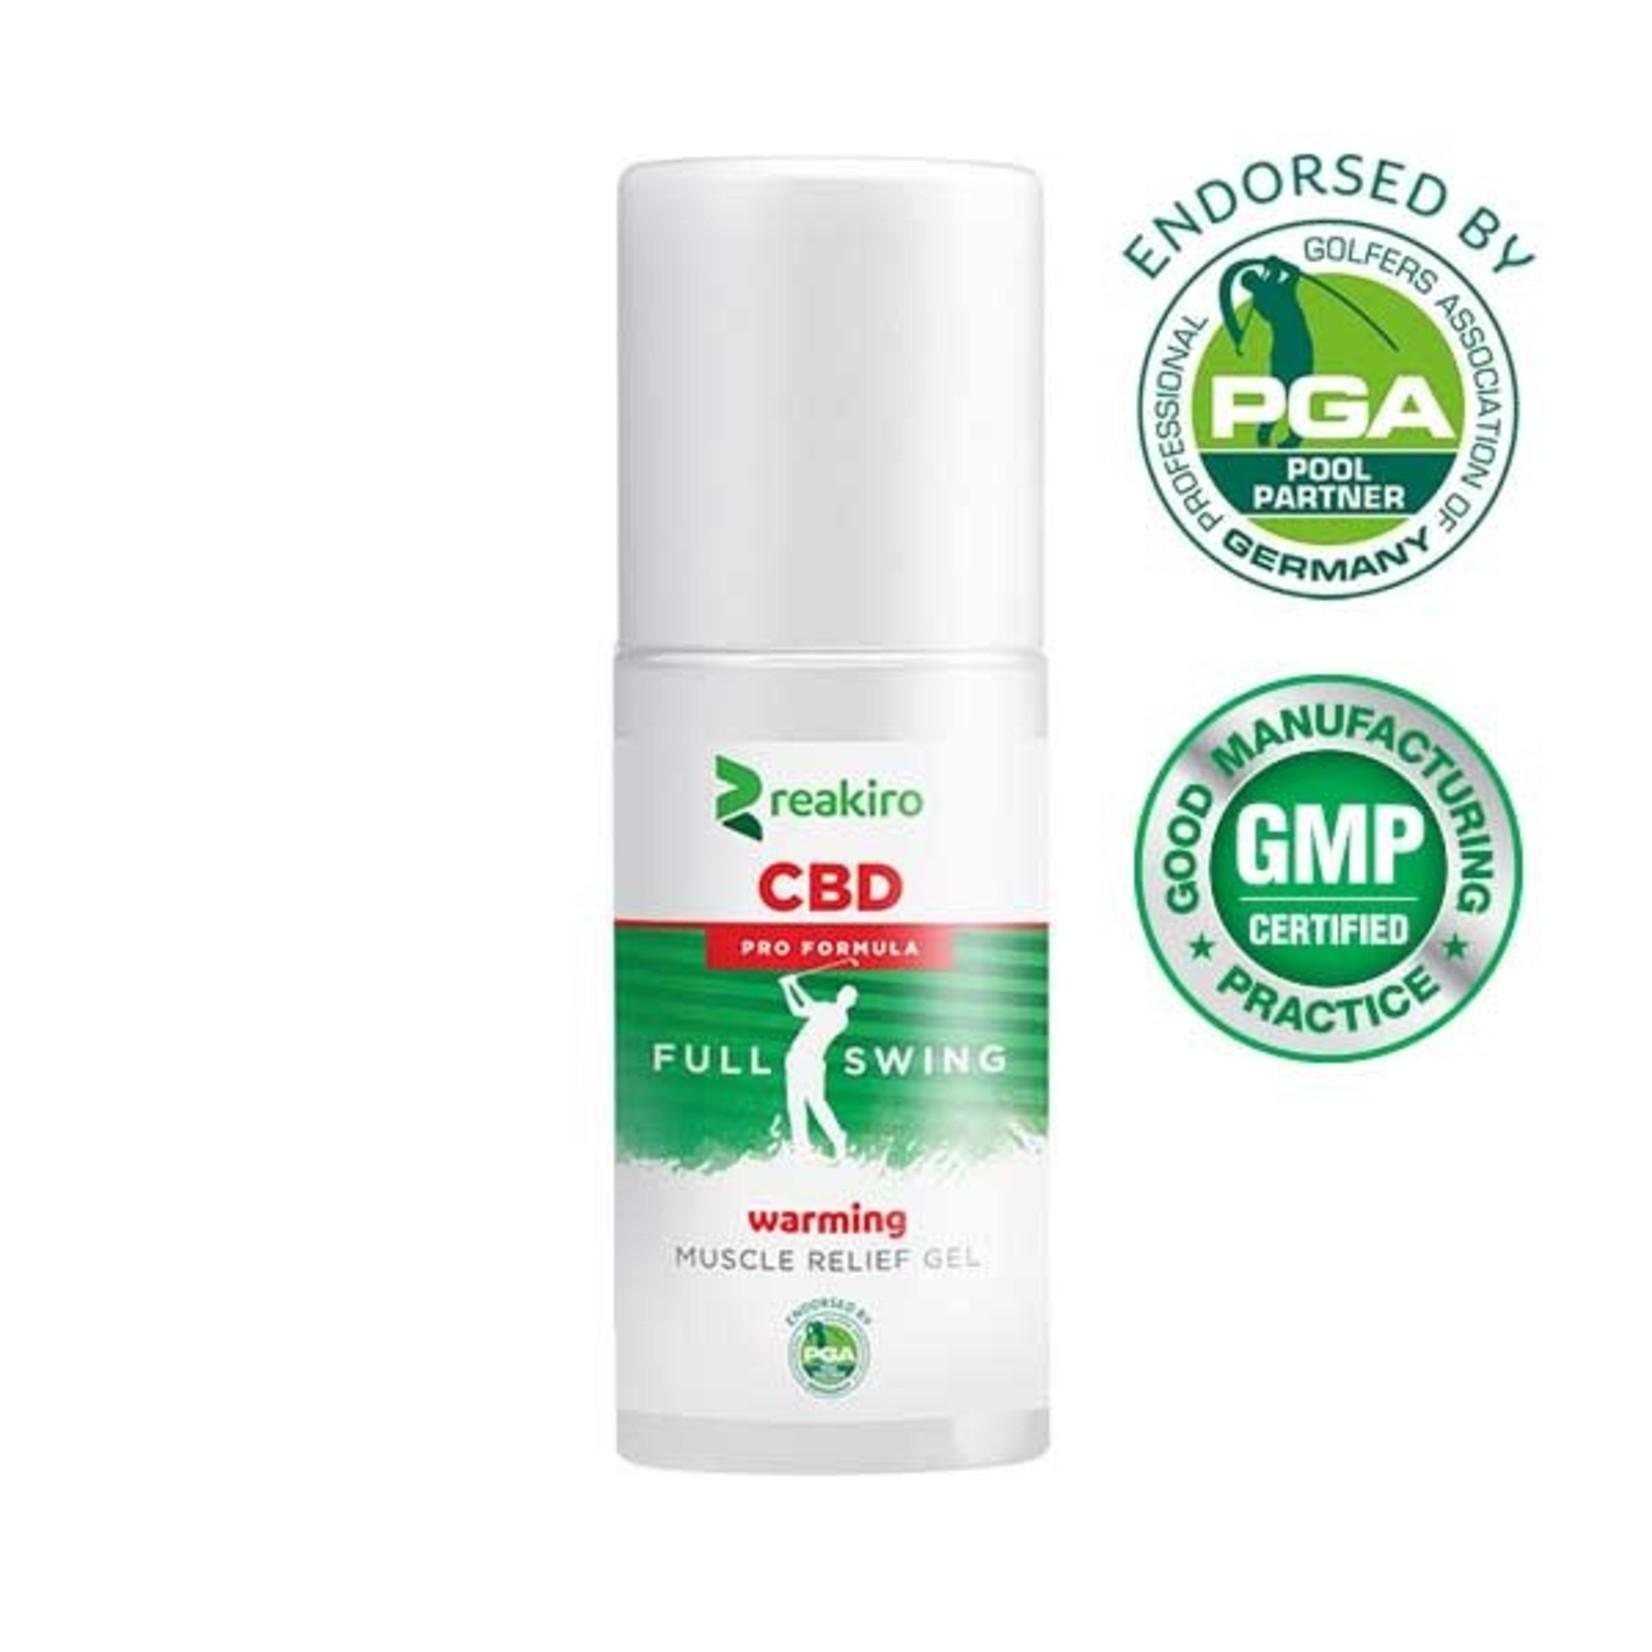 Reakiro CBD Golf Pro Formula Muscle Relief Gel Warming